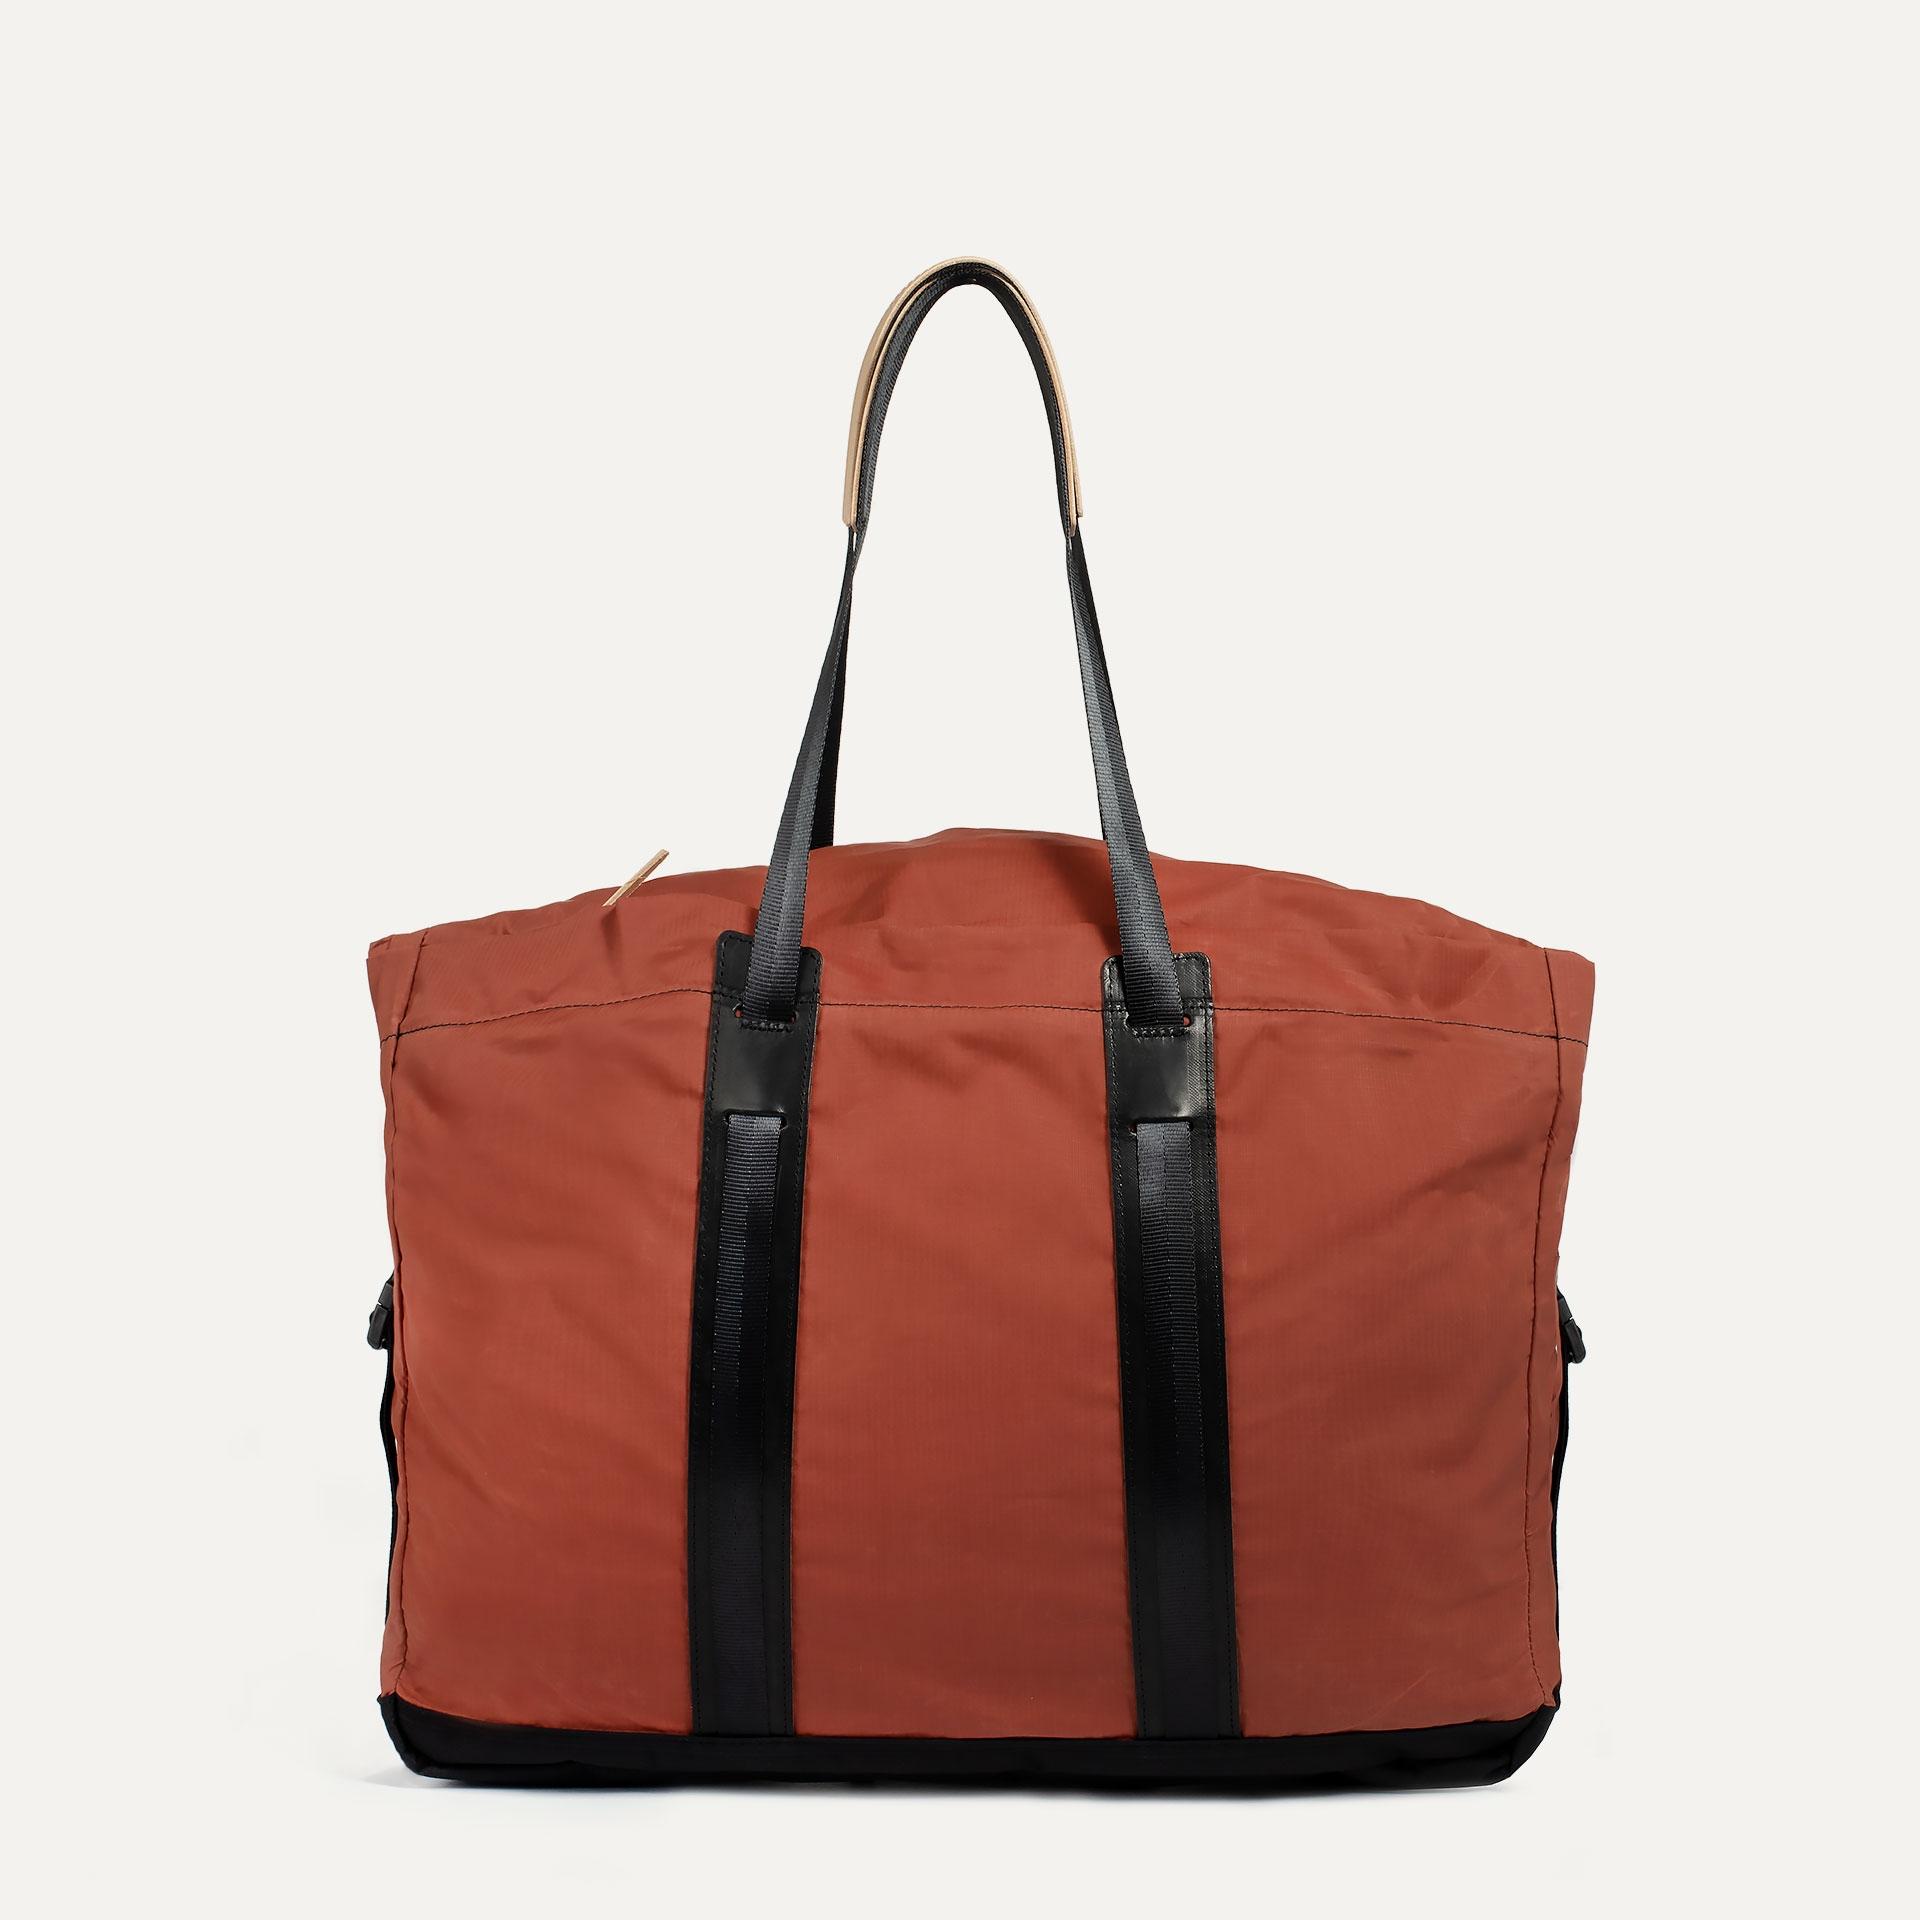 15L Barda Tote bag - Burgundy (image n°3)